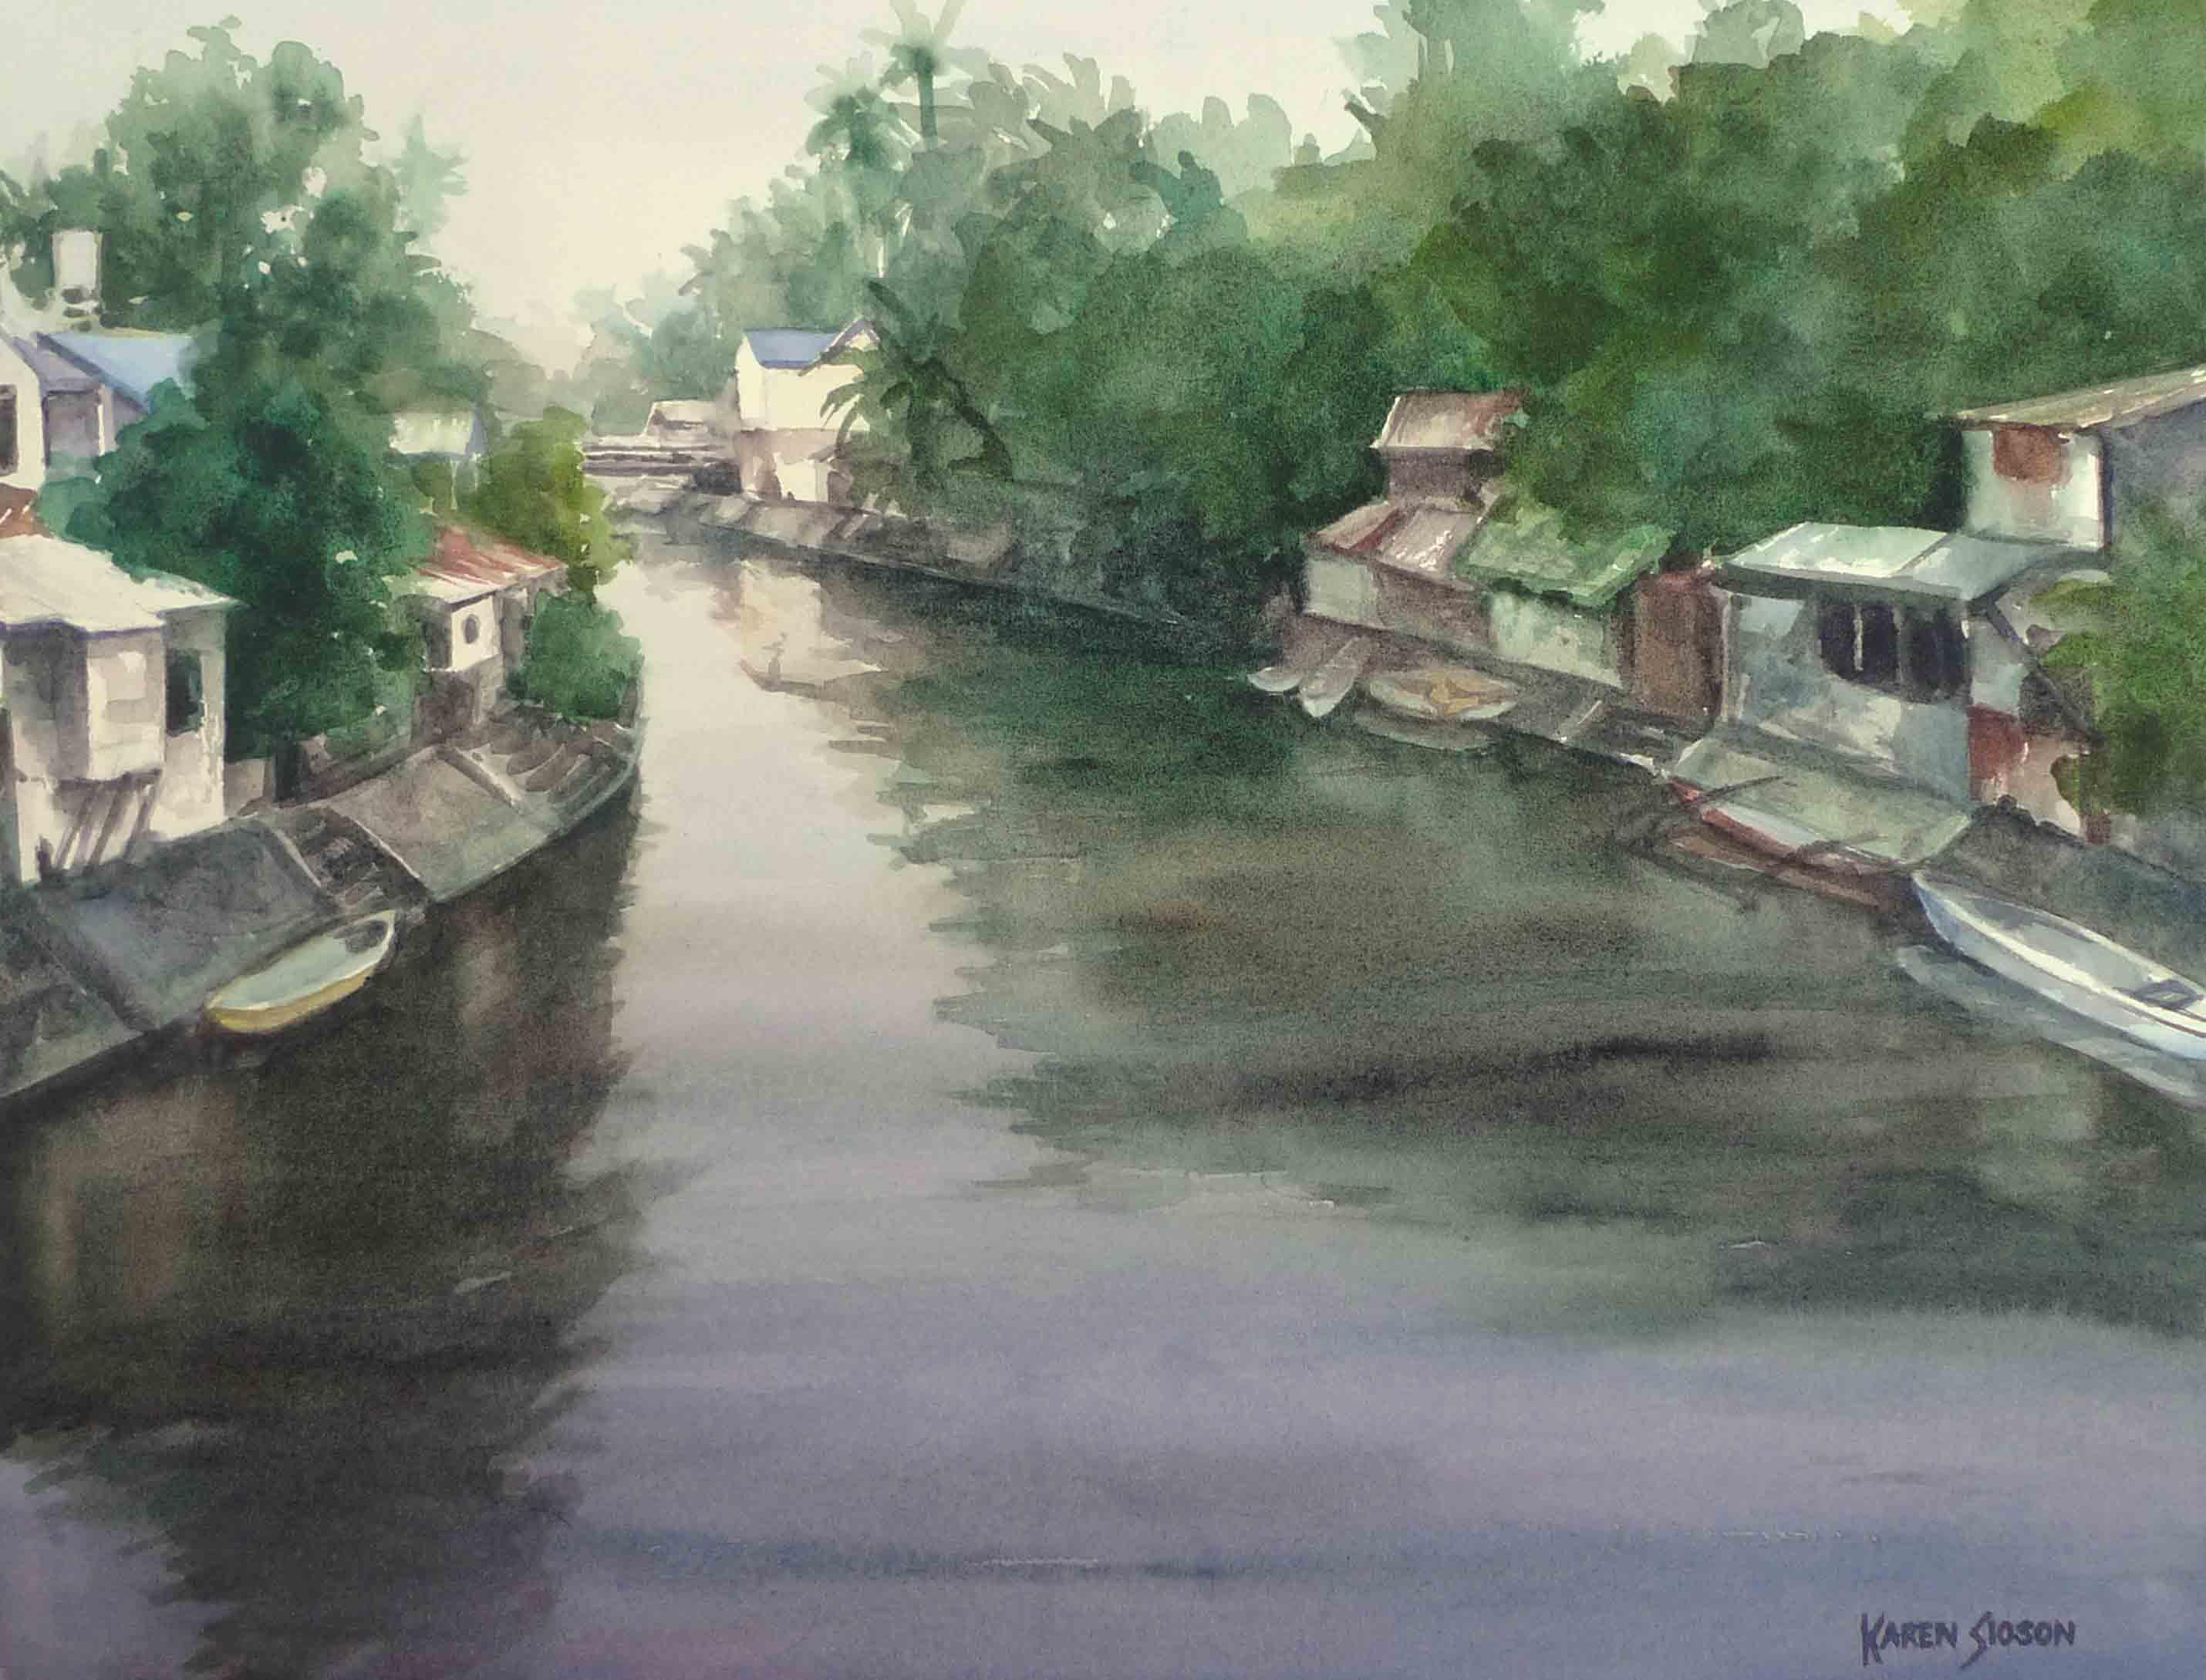 karensioson_calm_river